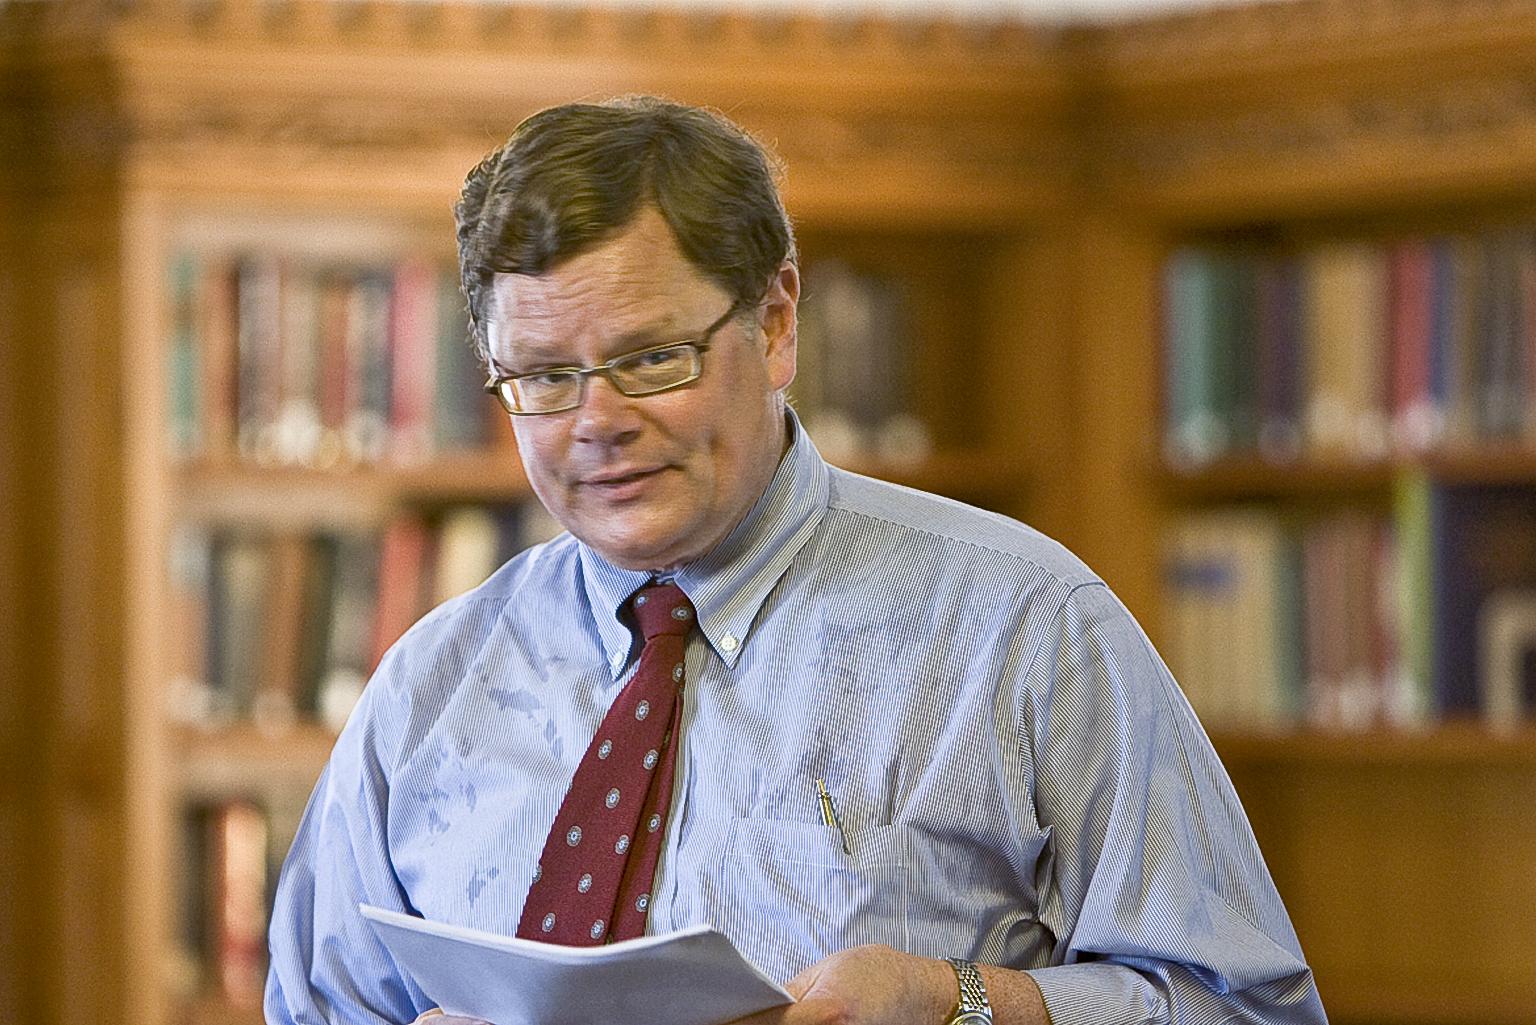 Harvard Law Prof. Reinier Kraakman '79